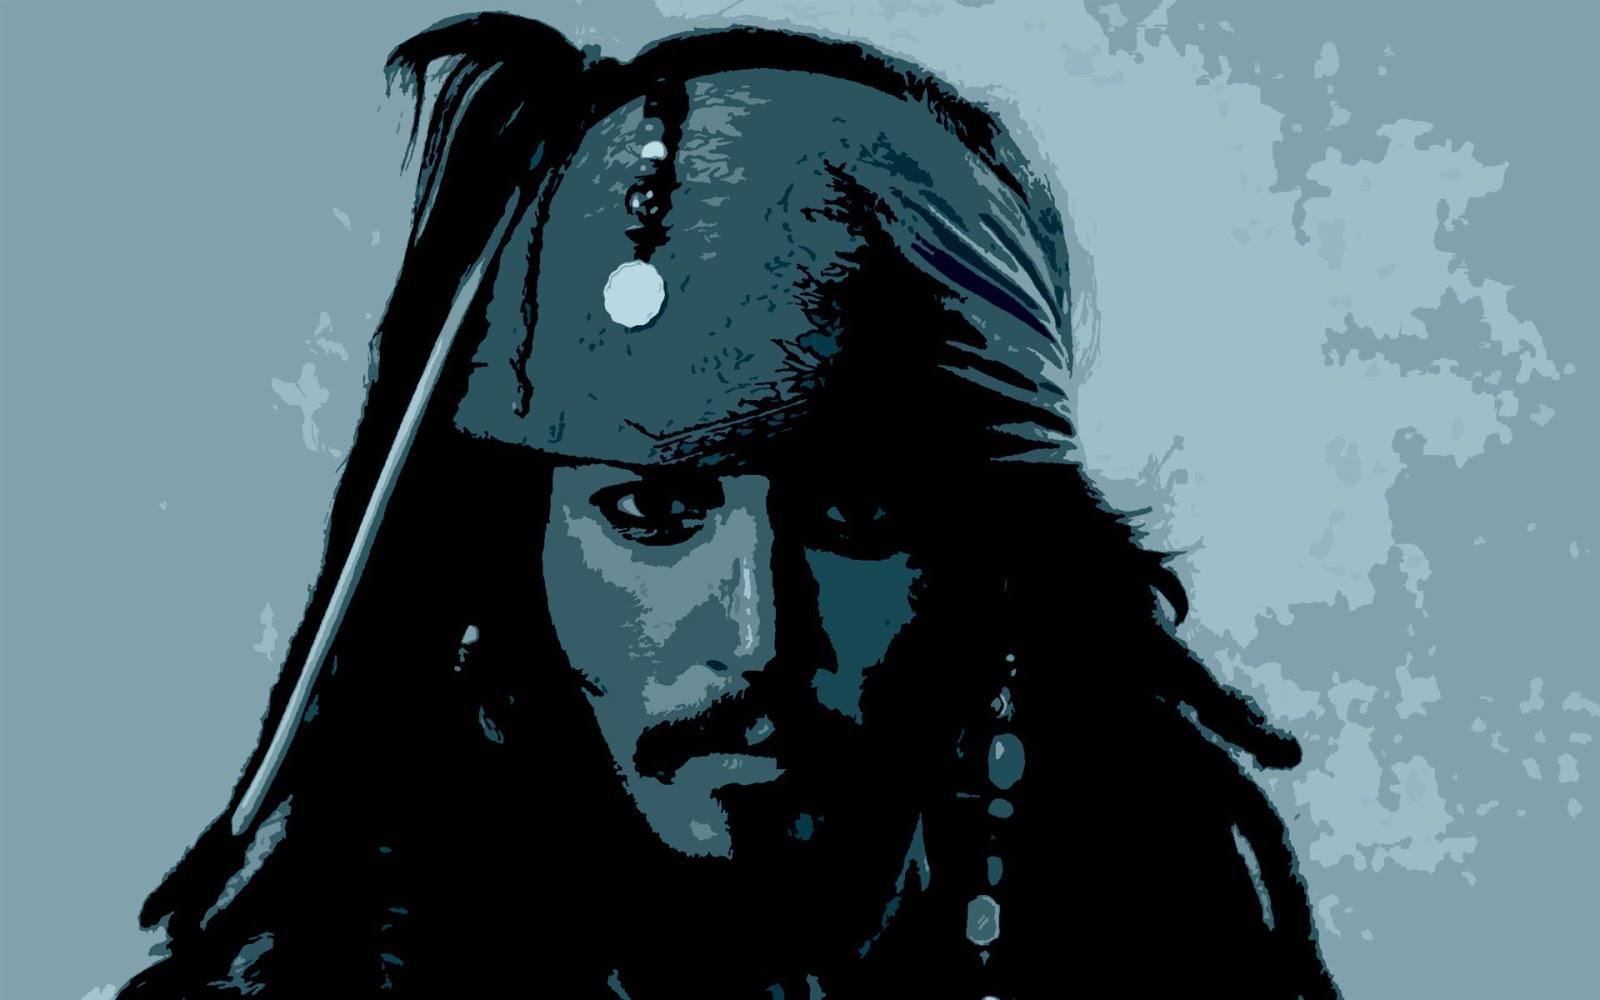 48 Jack Sparrow Wallpapers Hd Wallpaperceiling